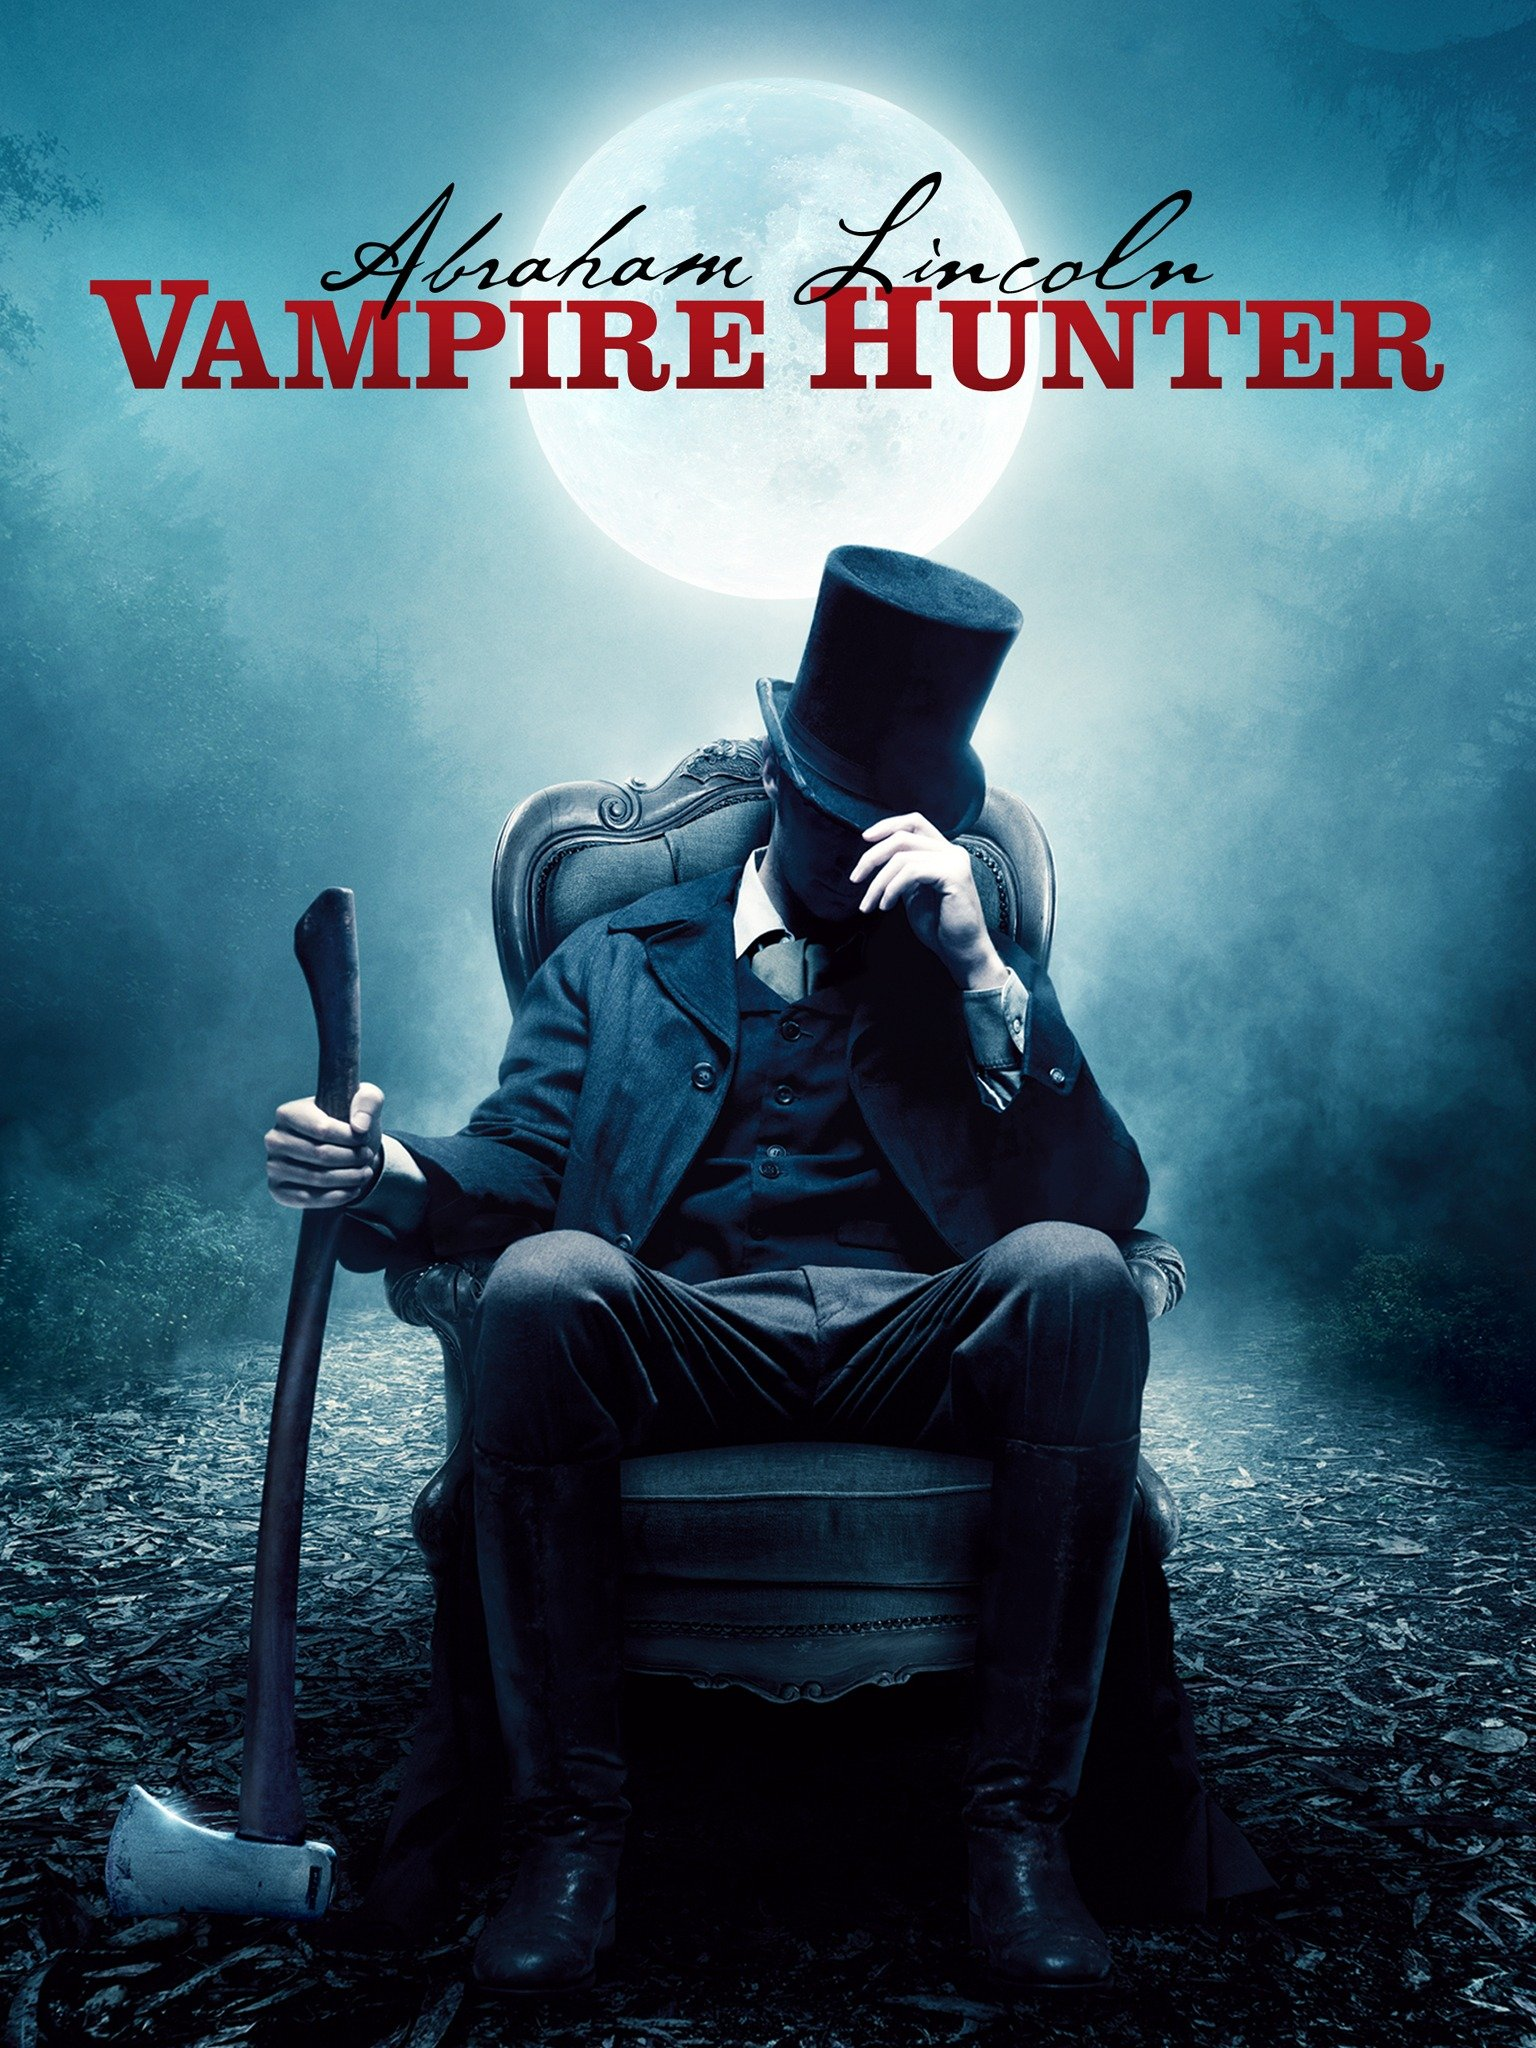 Abraham Lincoln Vampire Hunter 2012 Rotten Tomatoes